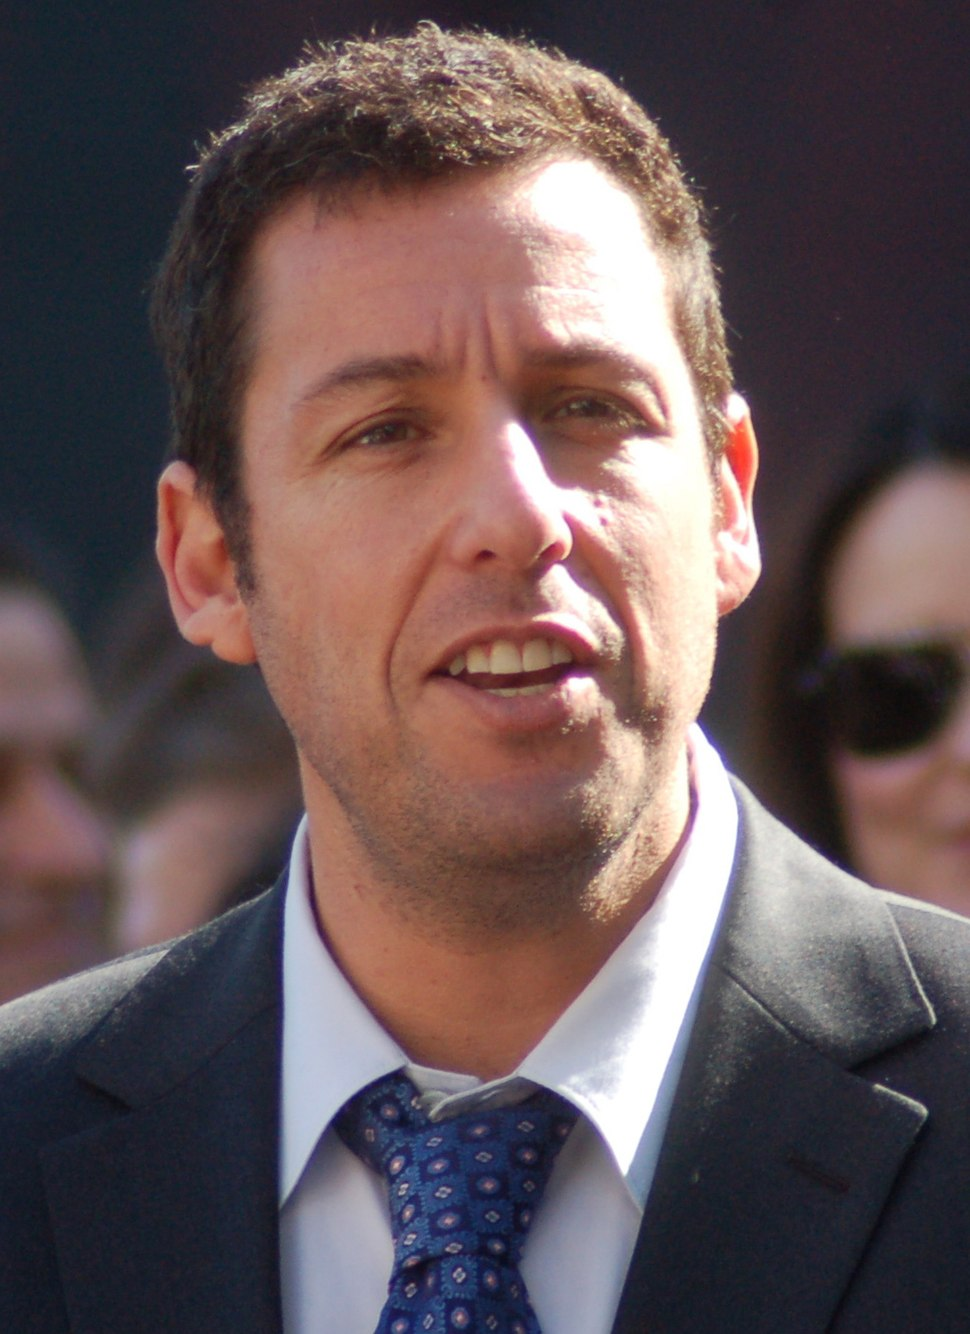 Adam Sandler 2011 (Cropped)